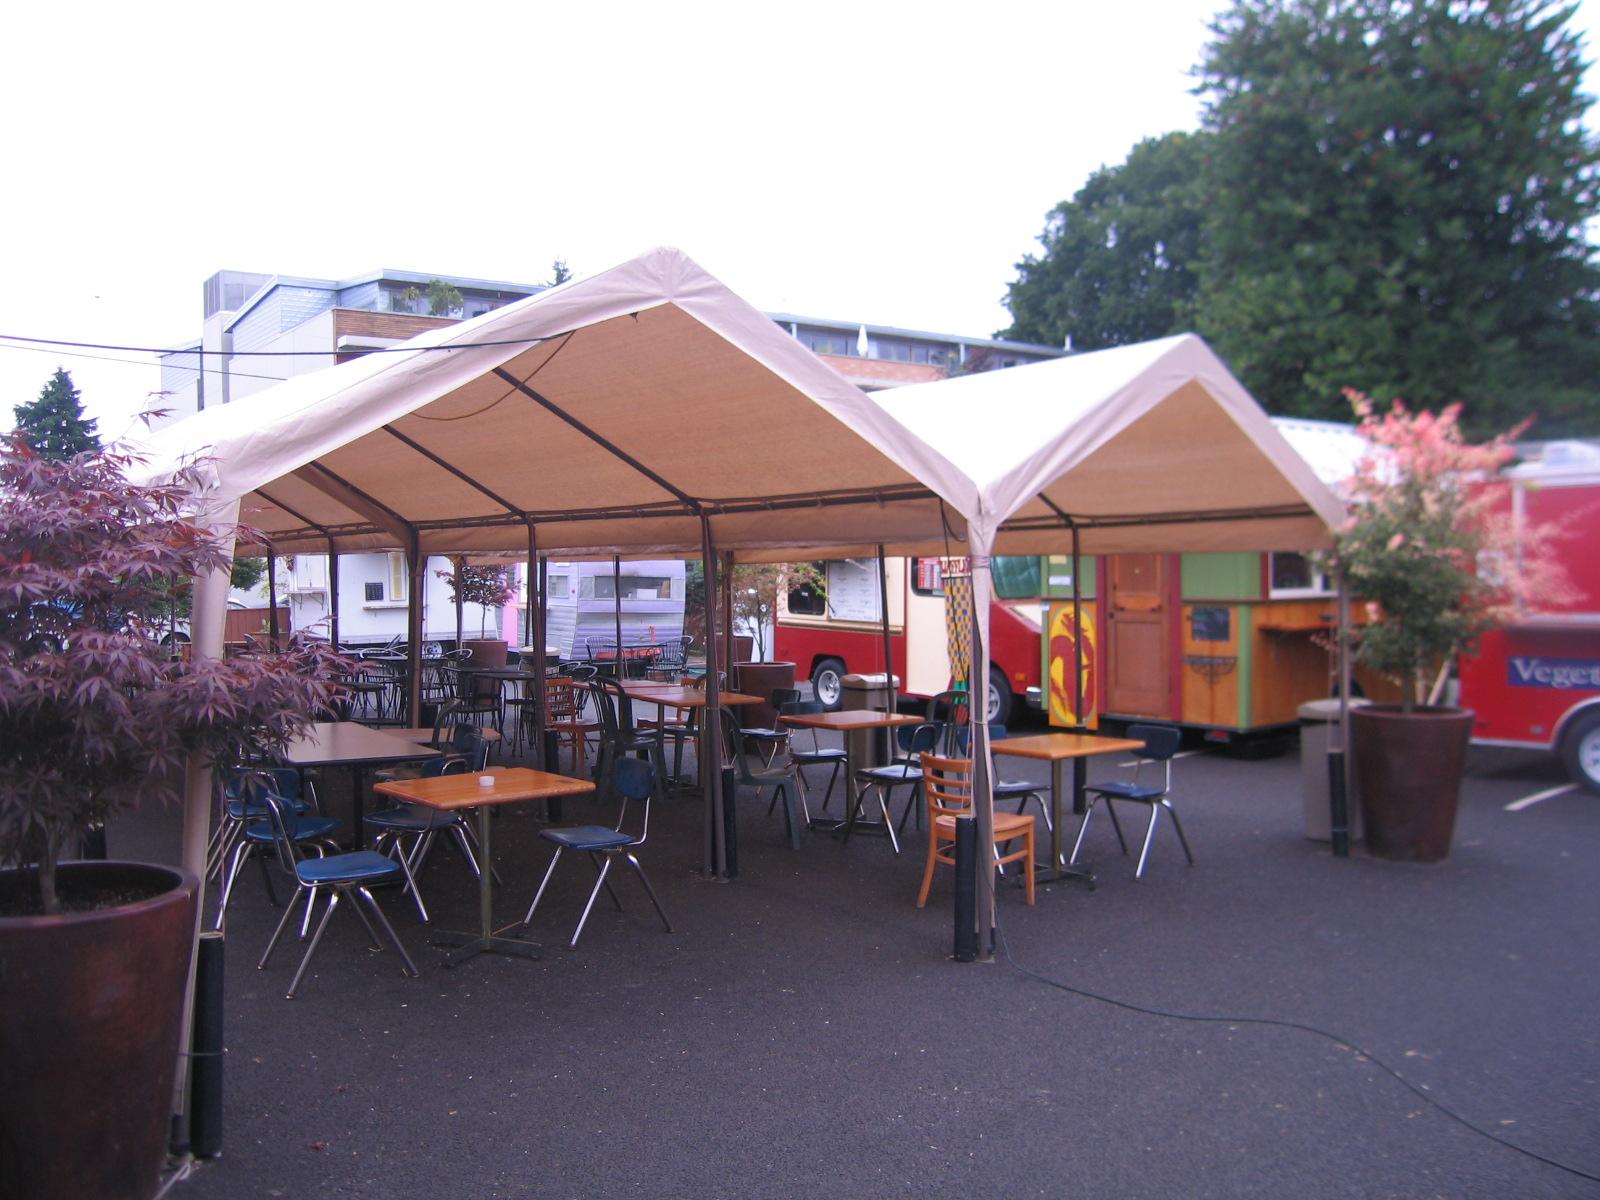 Portland Food Truck Pod Seating